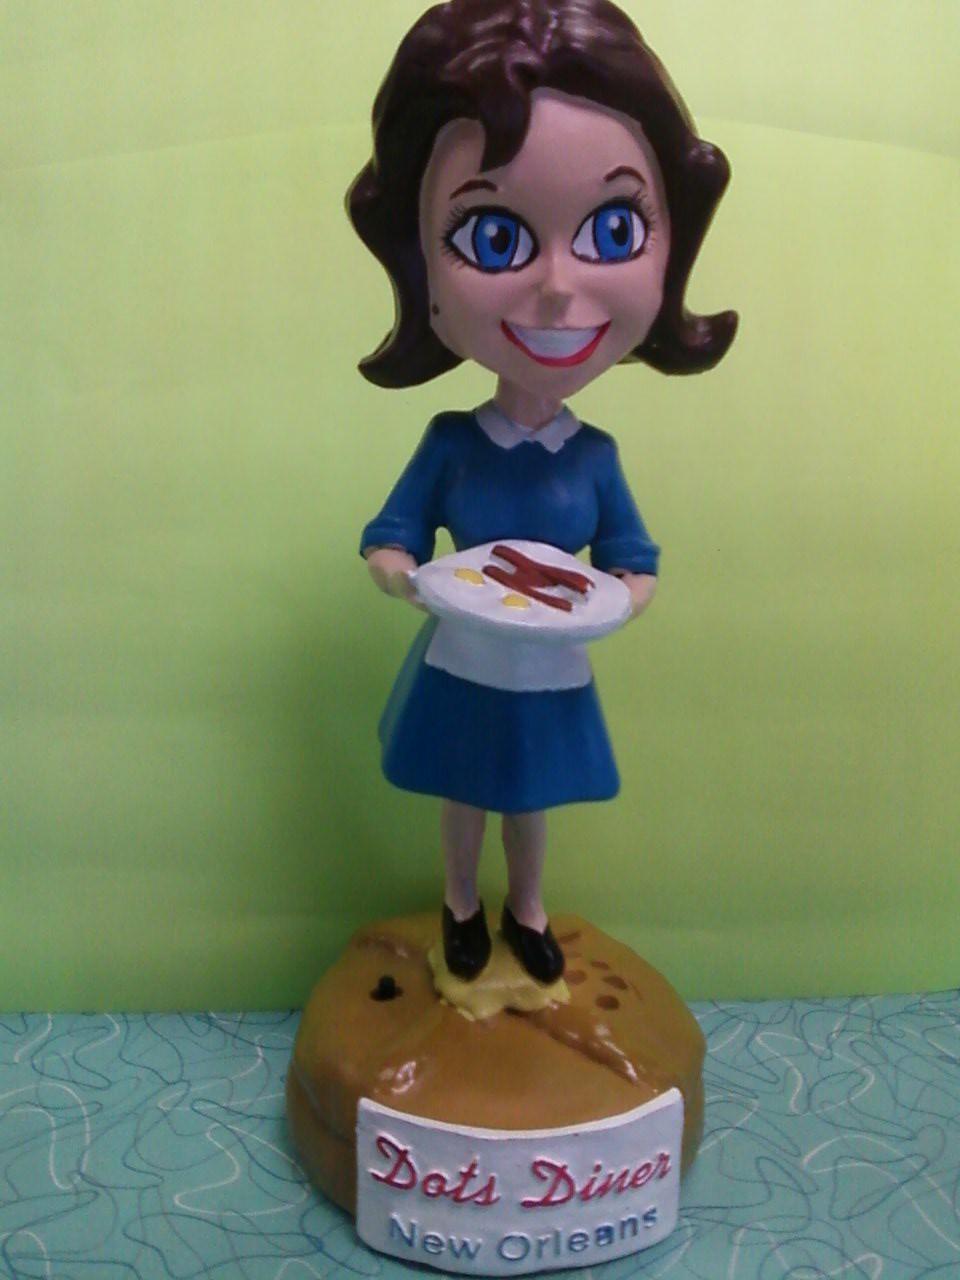 bobblehead doll